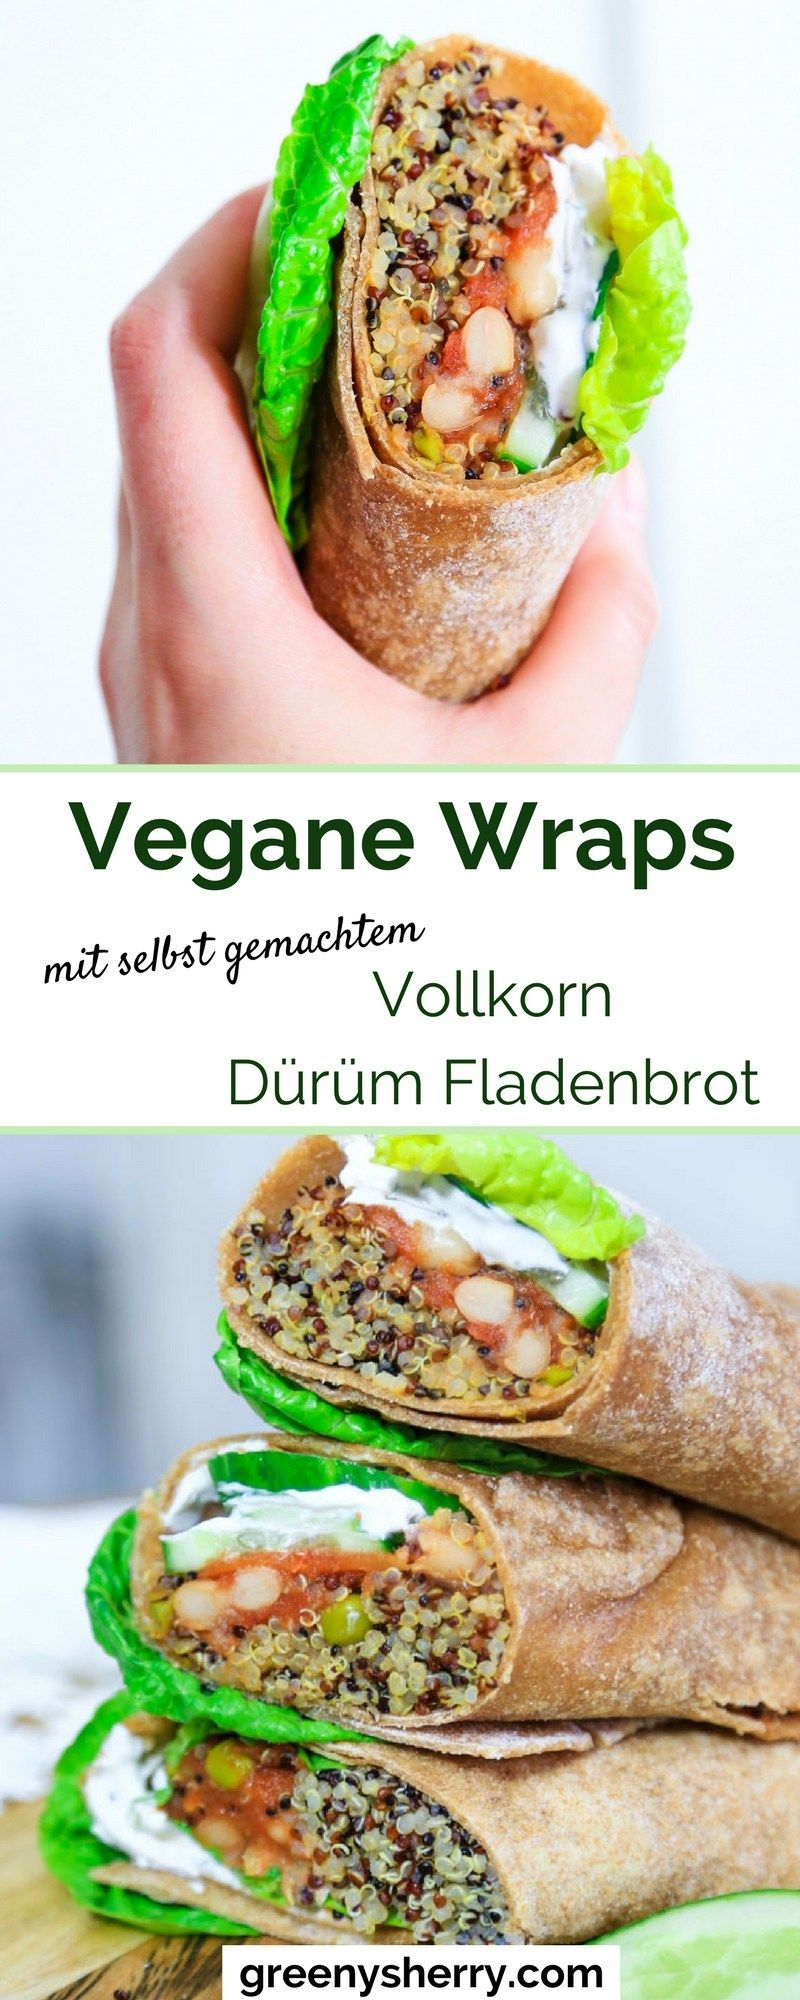 Vollkorn Dürüm-Fladenbrot für vegane Wraps #veganerezepte